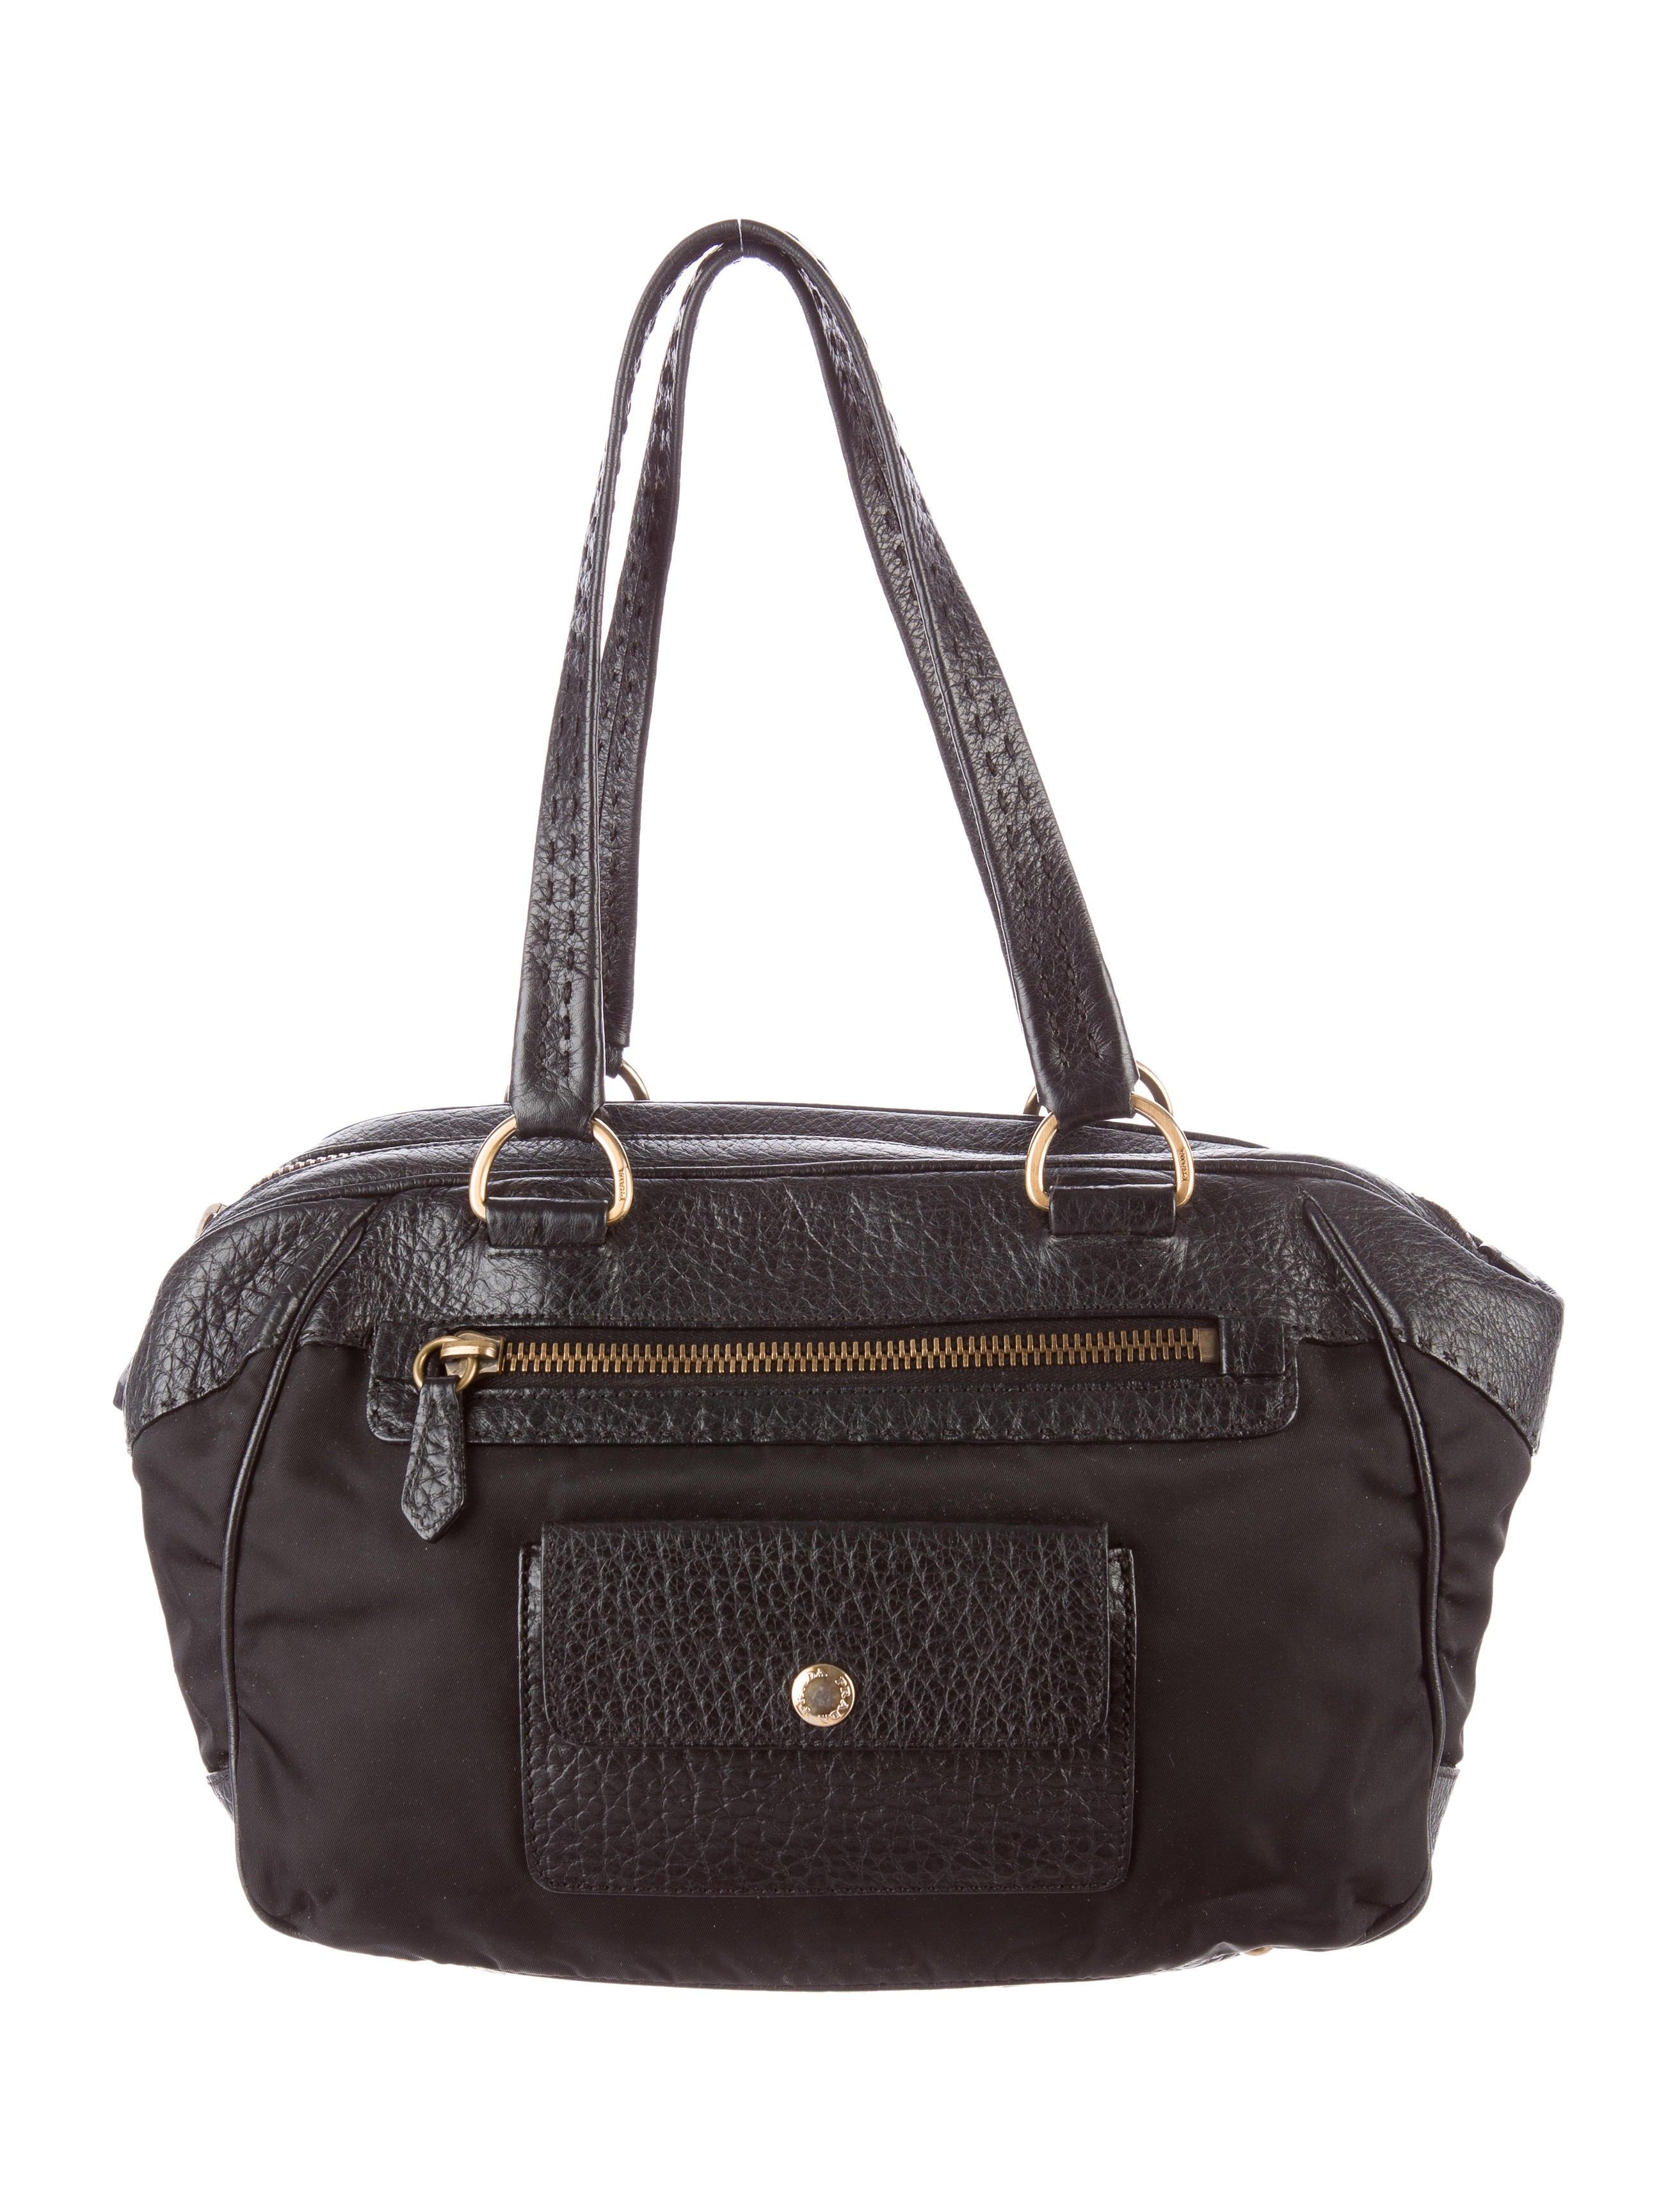 62db193a49 Prada Tessuto e Vitello Daino Shoulder Bag - Handbags - PRA103689